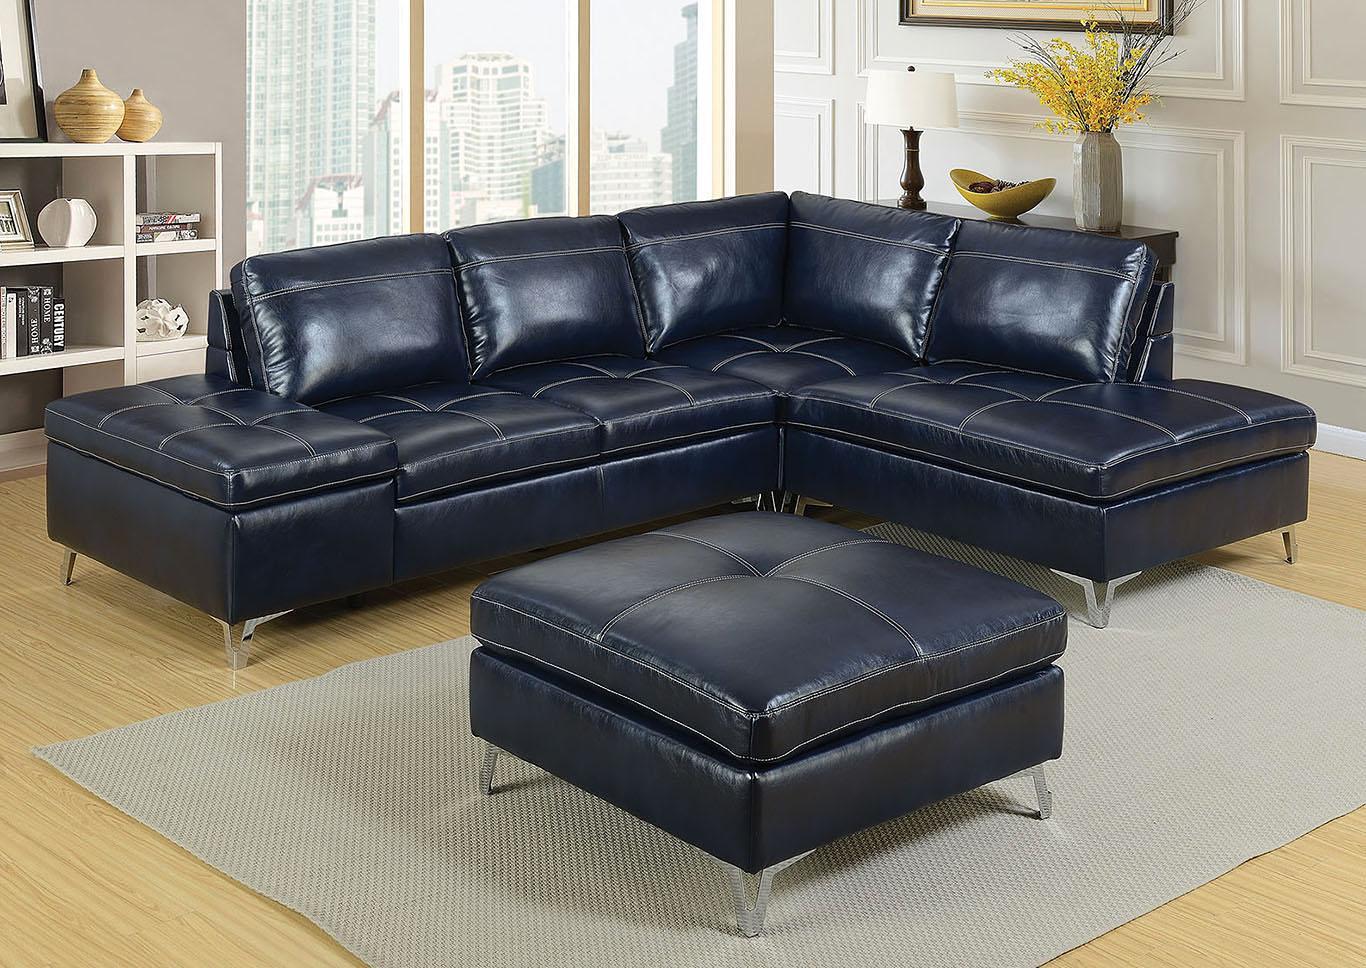 519433 Sadie Dark Blue Leather Sectional w/Ottoman